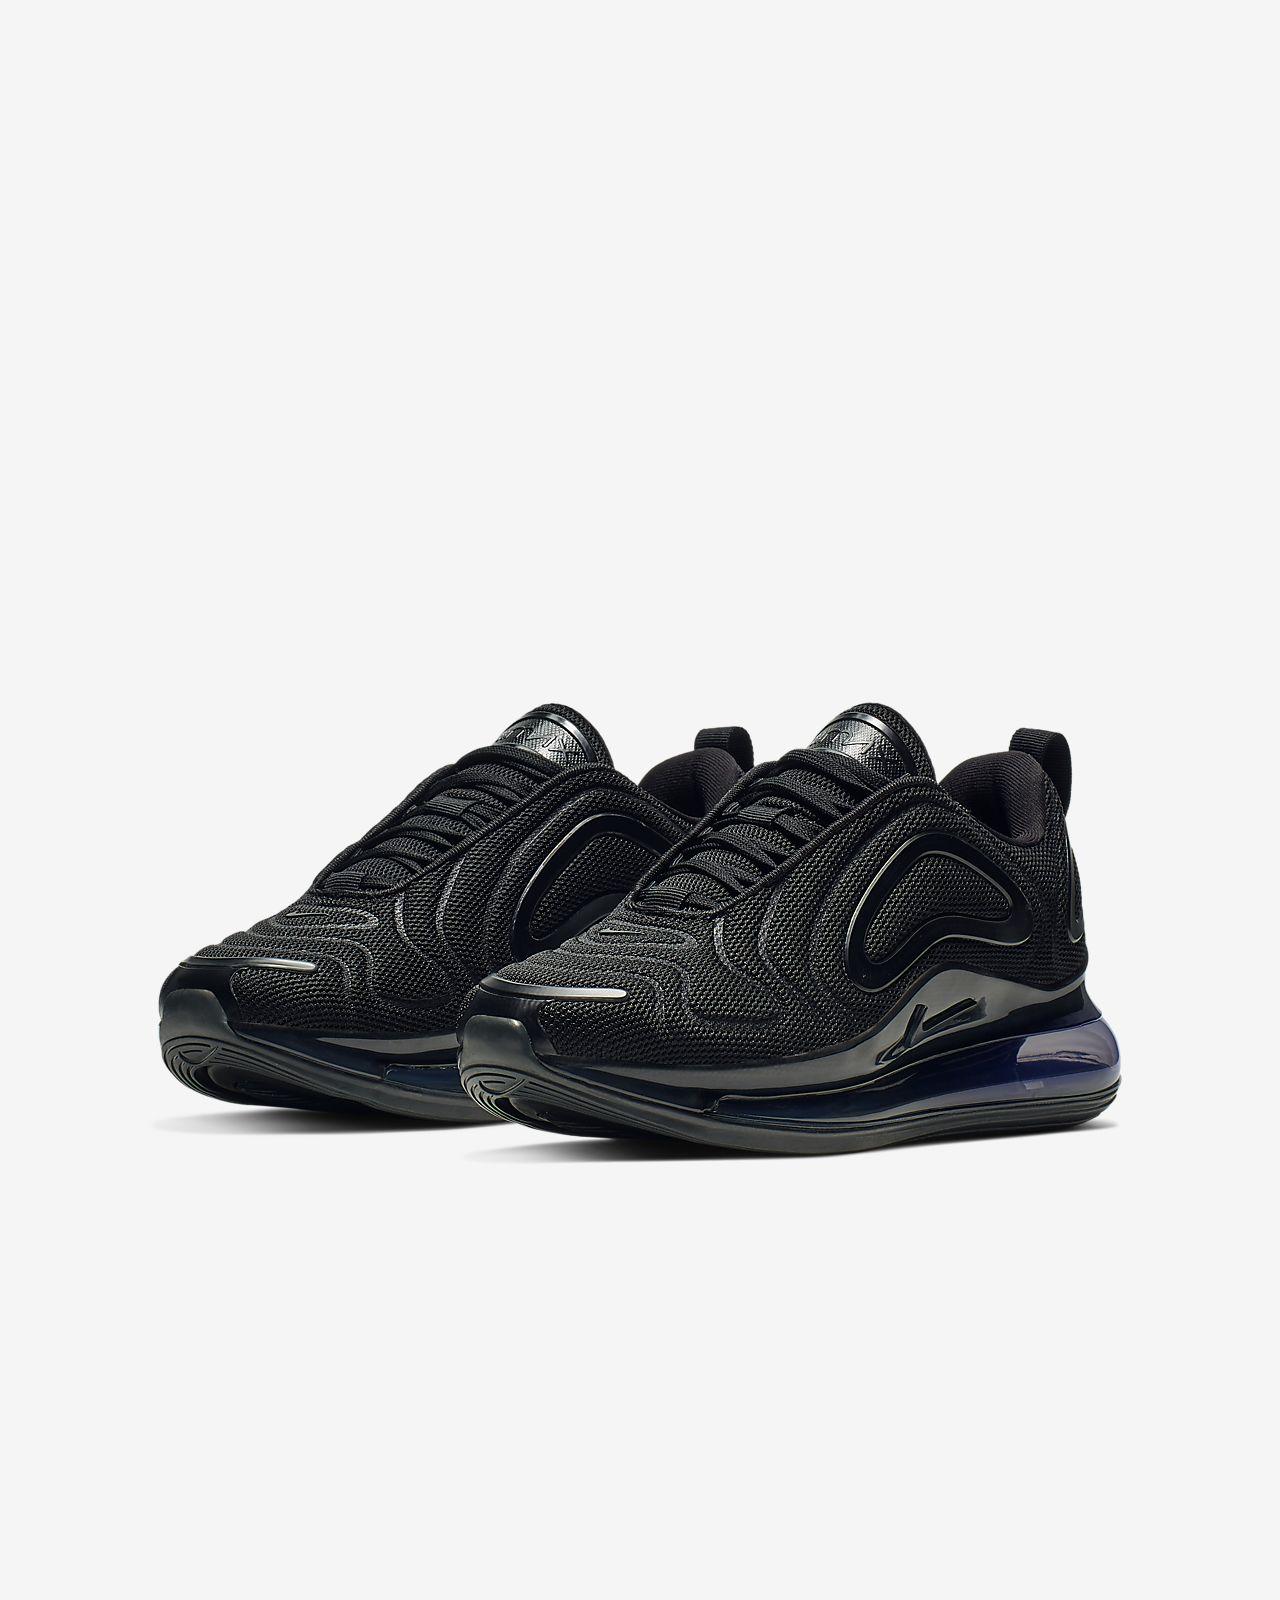 09741befa1 nike air max 720 black Nike Air Max 720 Little/Big Kids' Shoe.